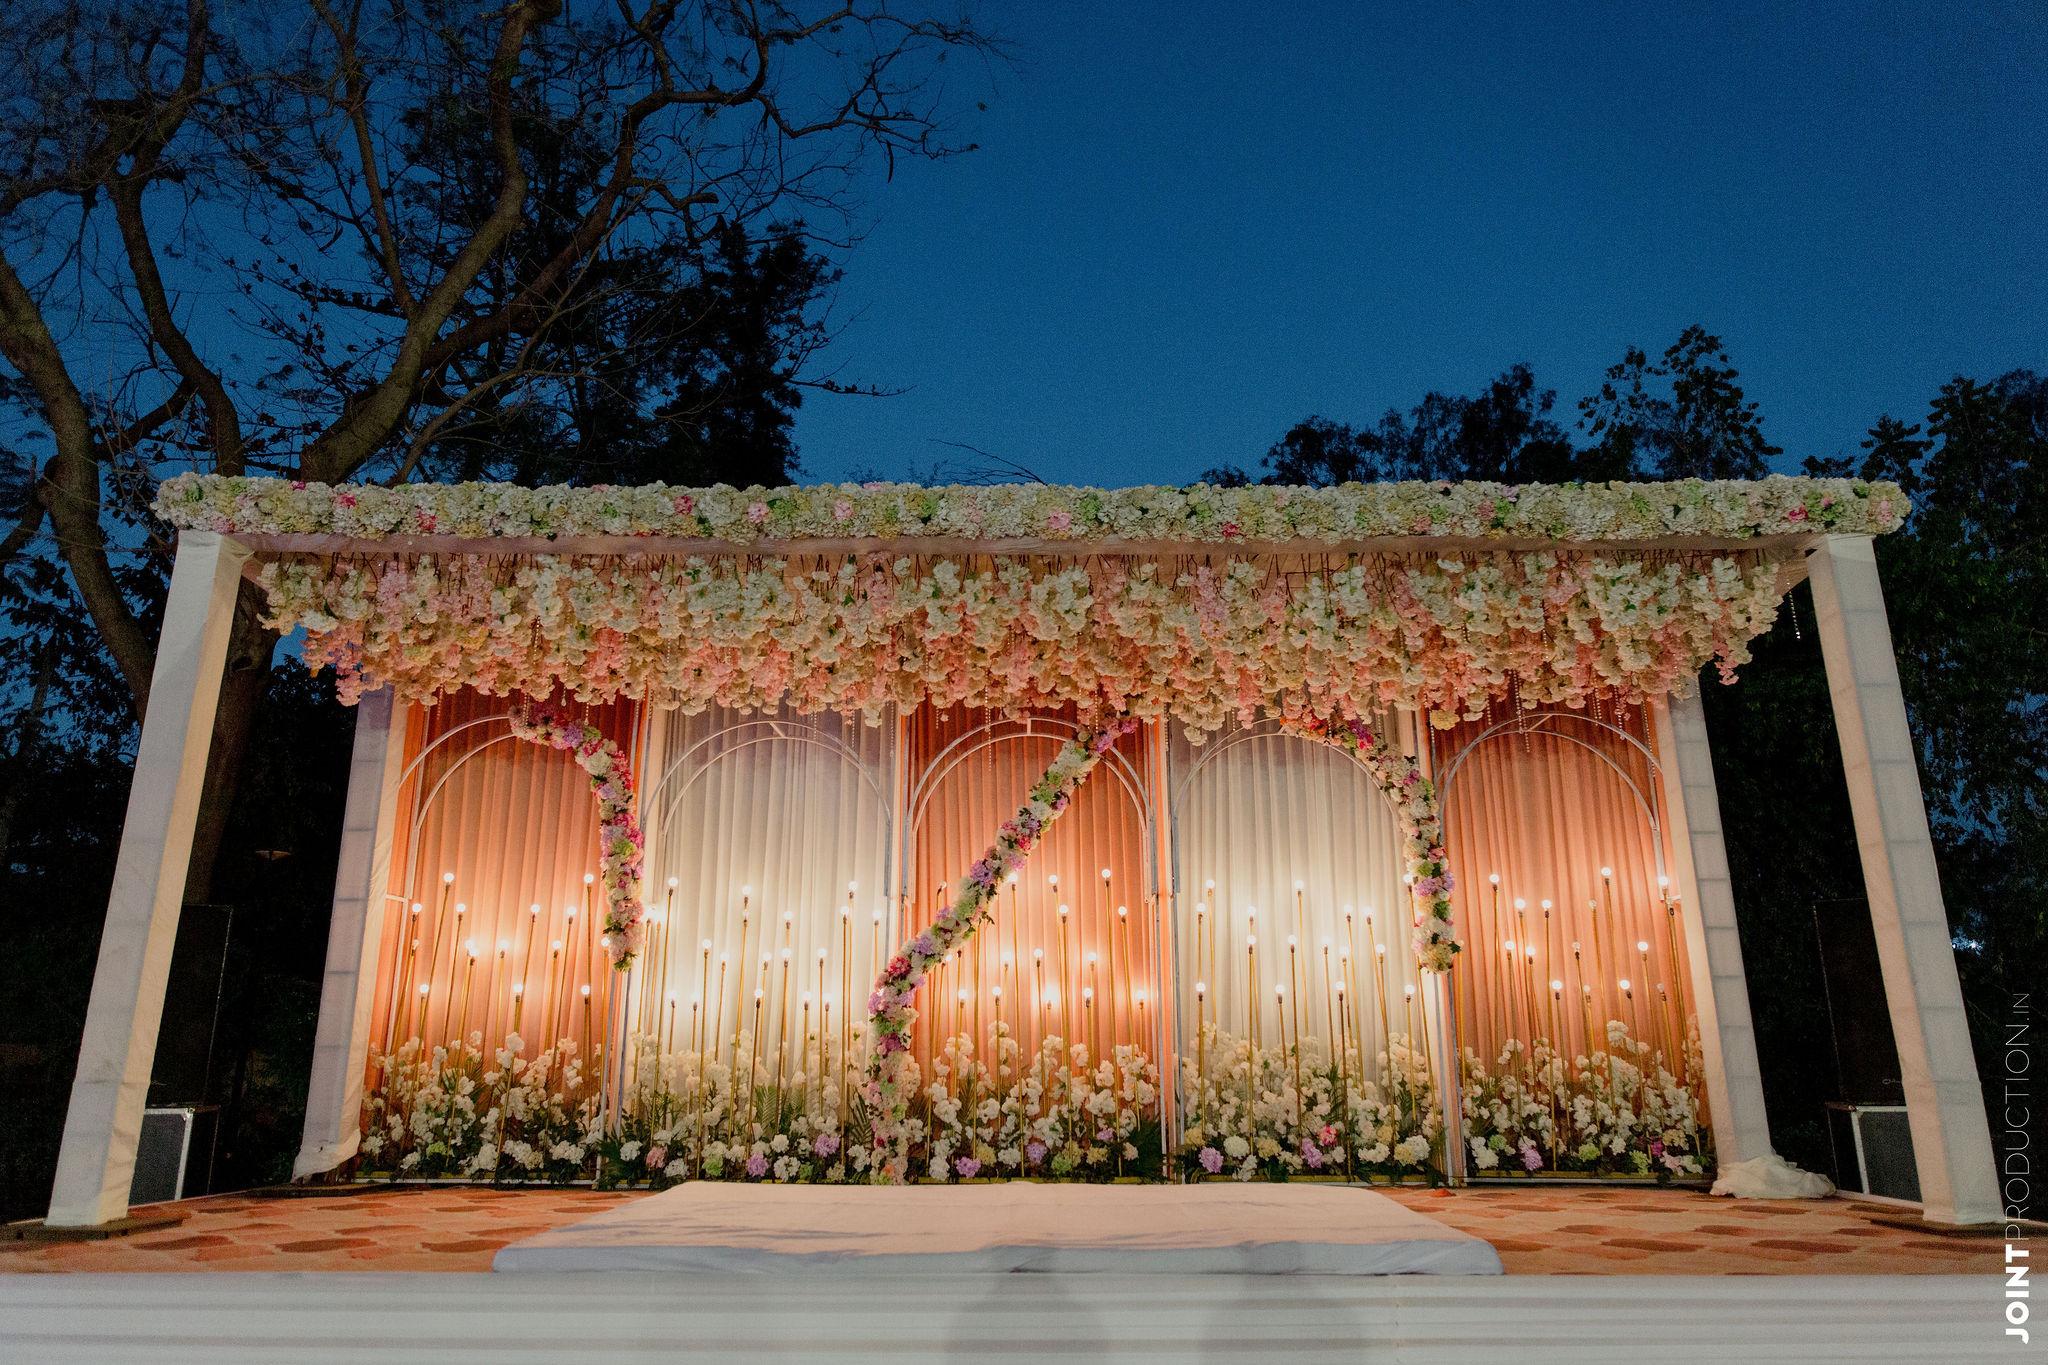 pastel themed wedding decor